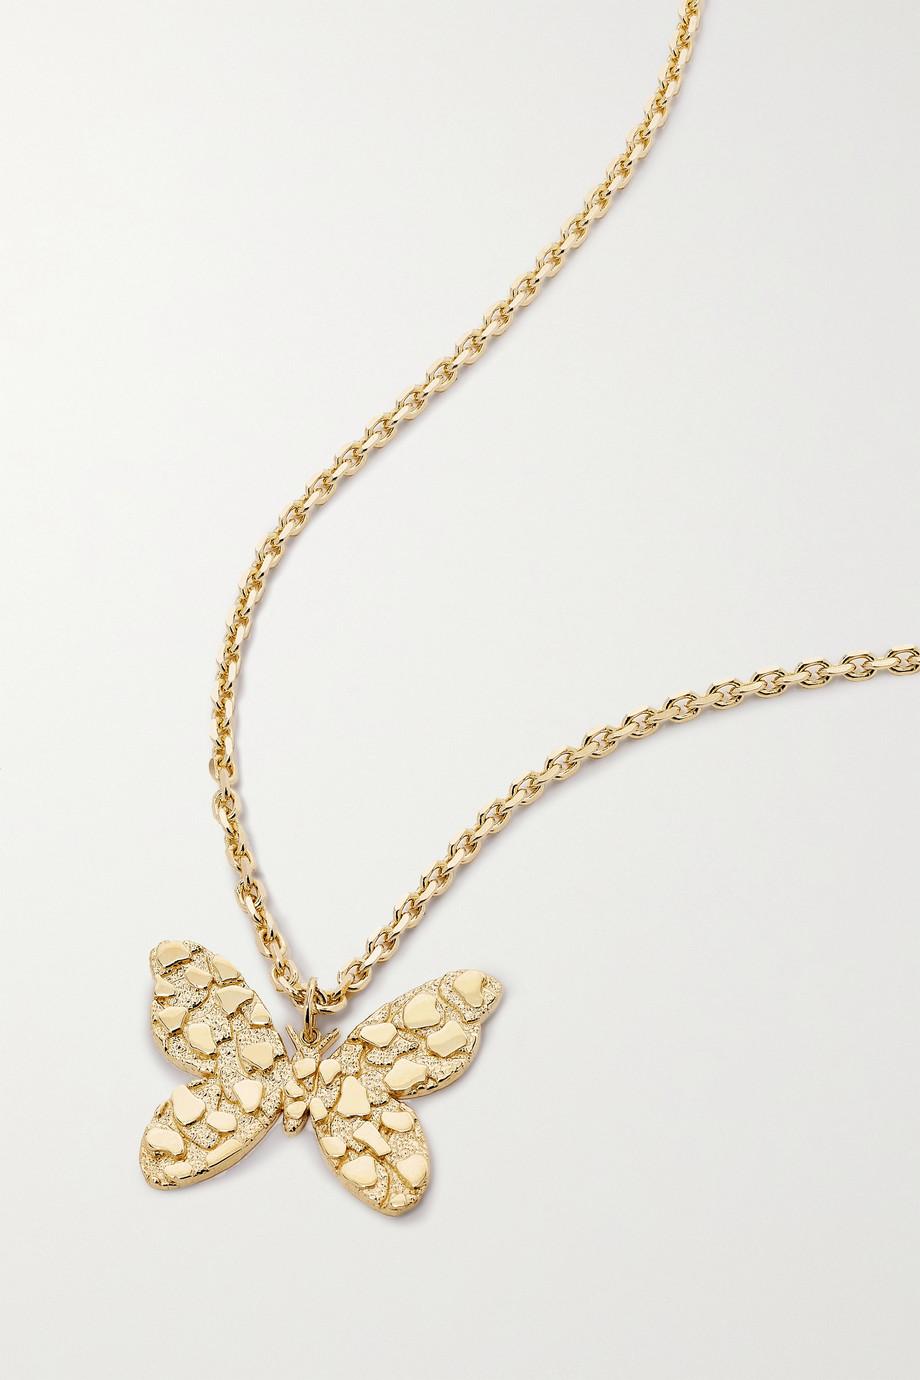 Sydney Evan Large Butterfly Kette aus 14 Karat Gold